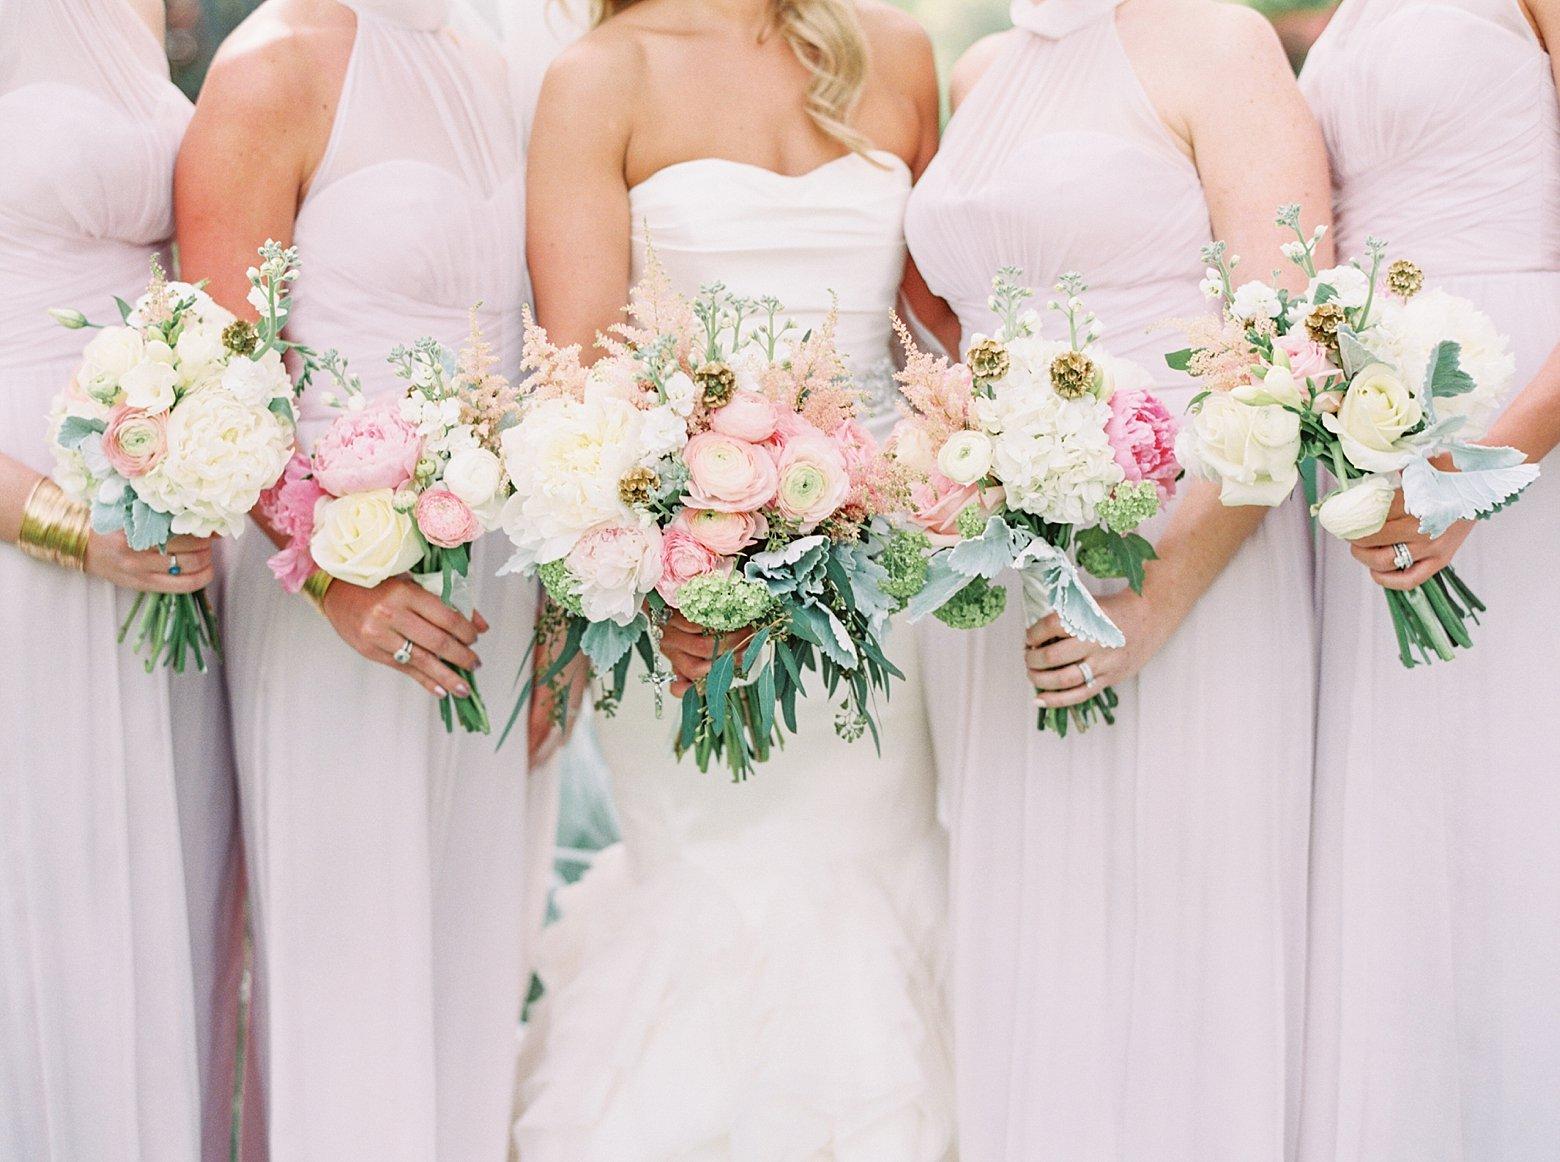 lauren_fair_photography_april_lynn_designs_stasia_matt_spring_cairnwood_estate_wedding_northeast_philadelphia_blush_pink_gold_wedding_invitation_stationery_0067